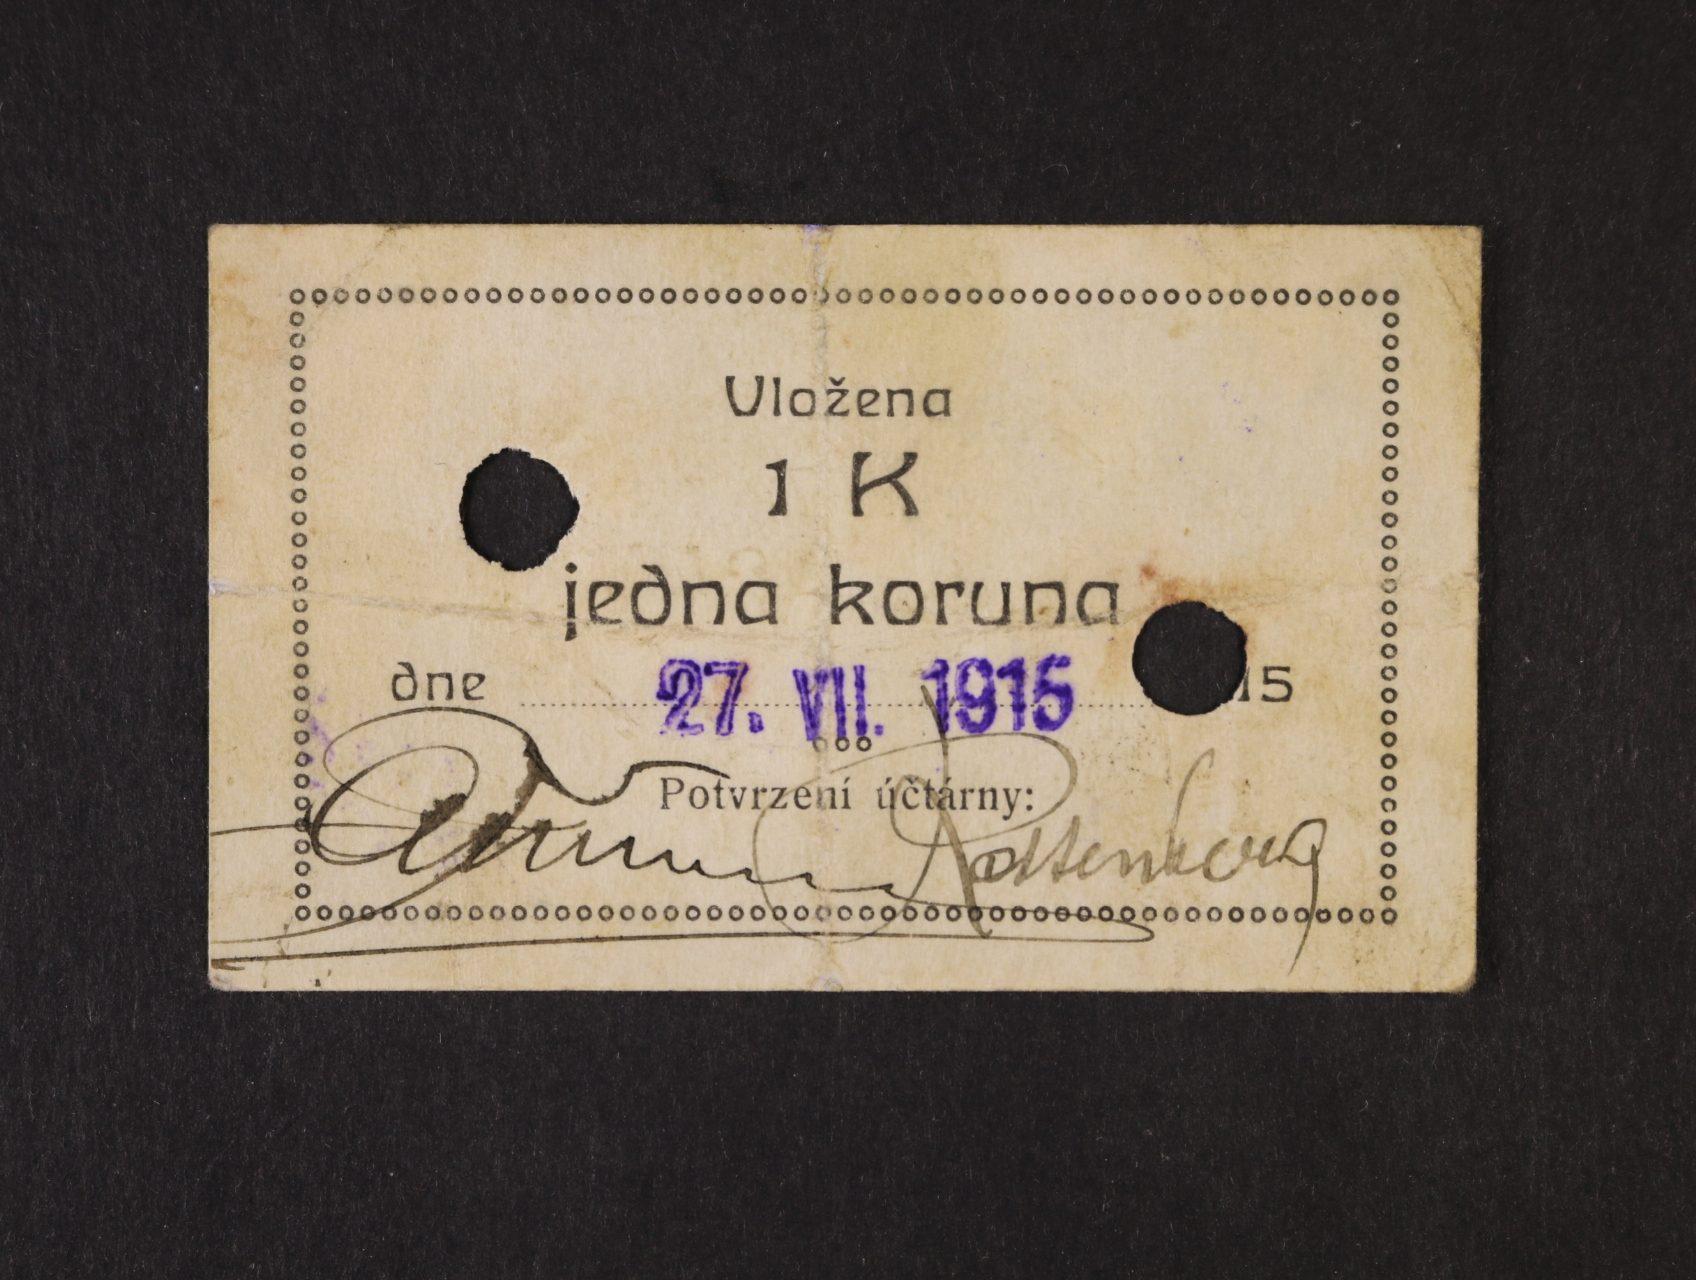 Pelhřimov, 1 K s raz. 27.VII.1915 Spořitelna města, raz., 2x perforační otvor, D.H. 158.1.2b